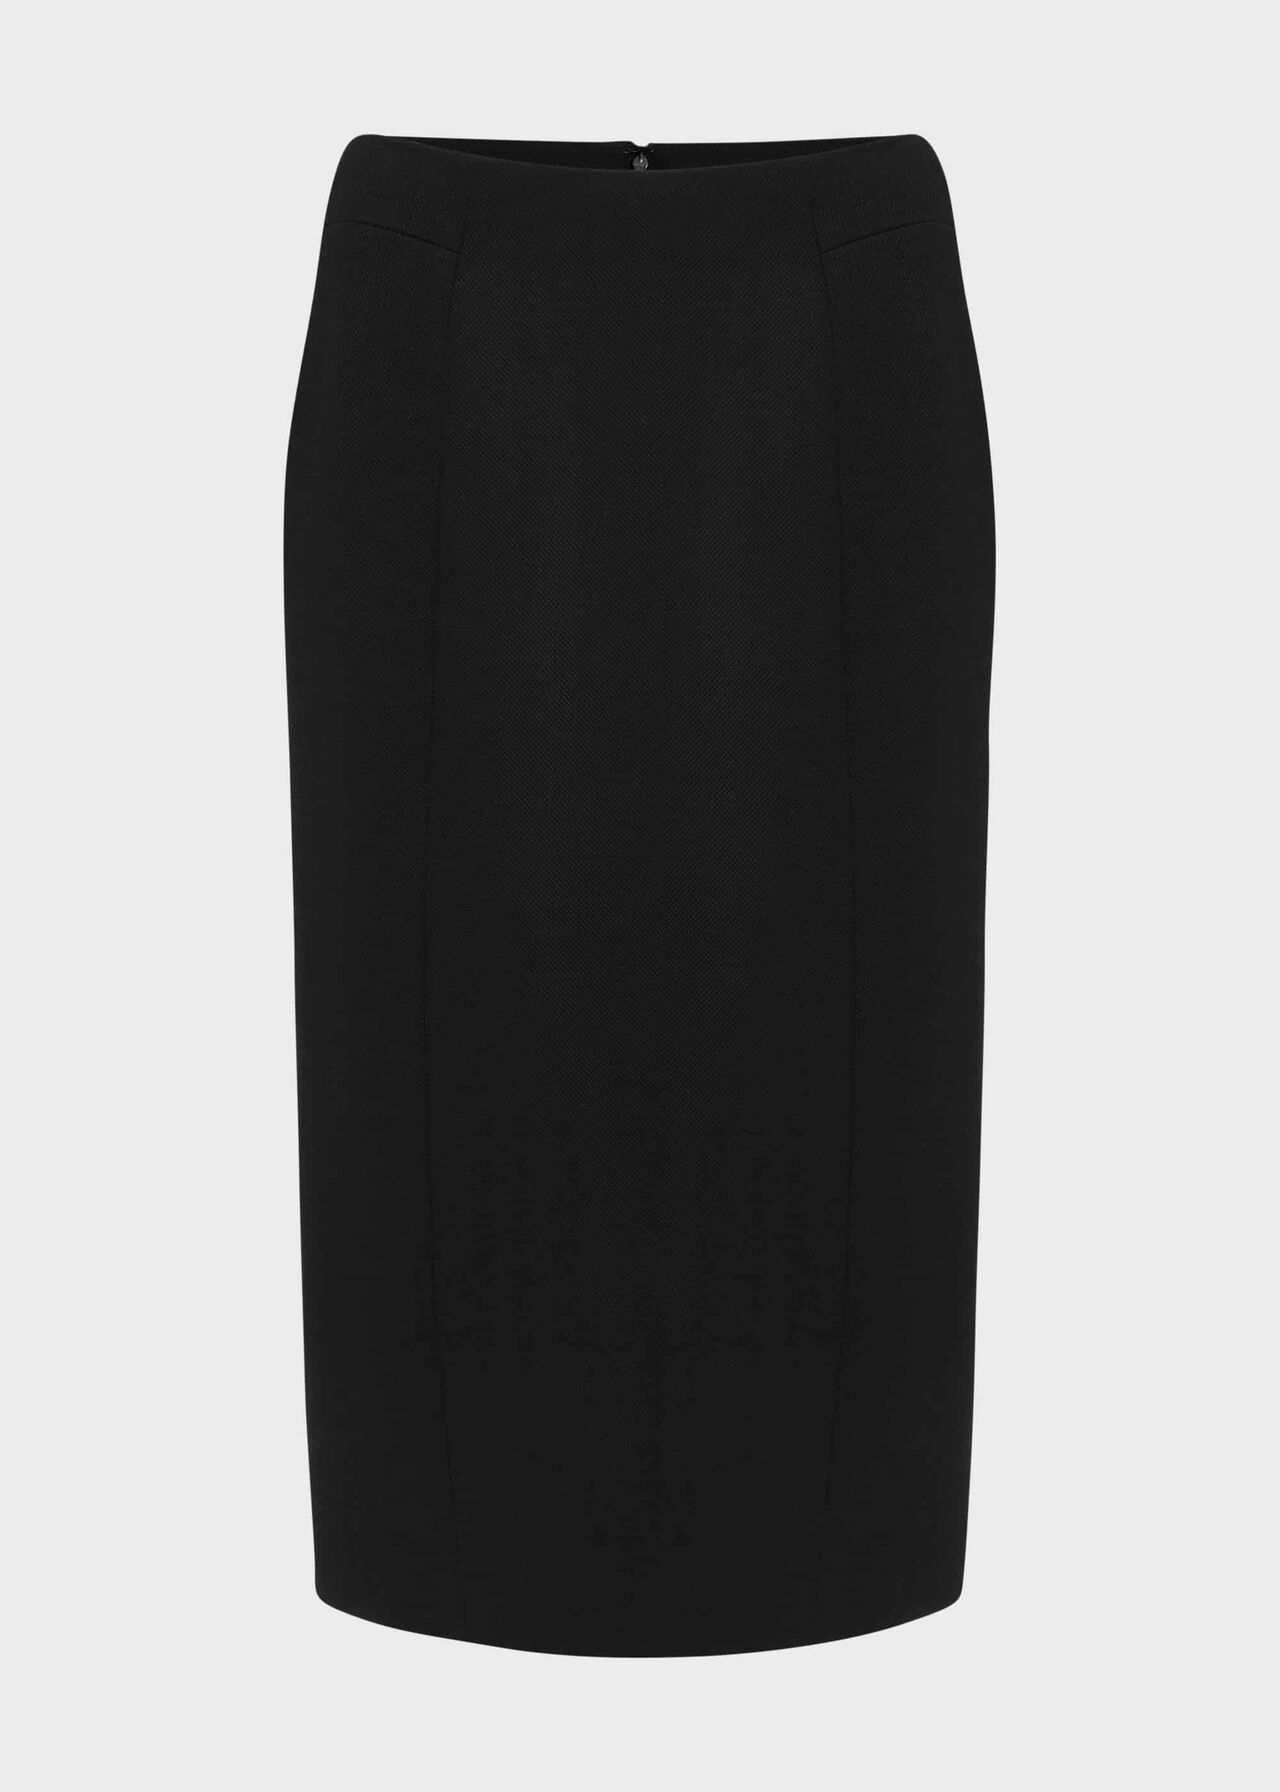 Ophelia Pencil Skirt Black